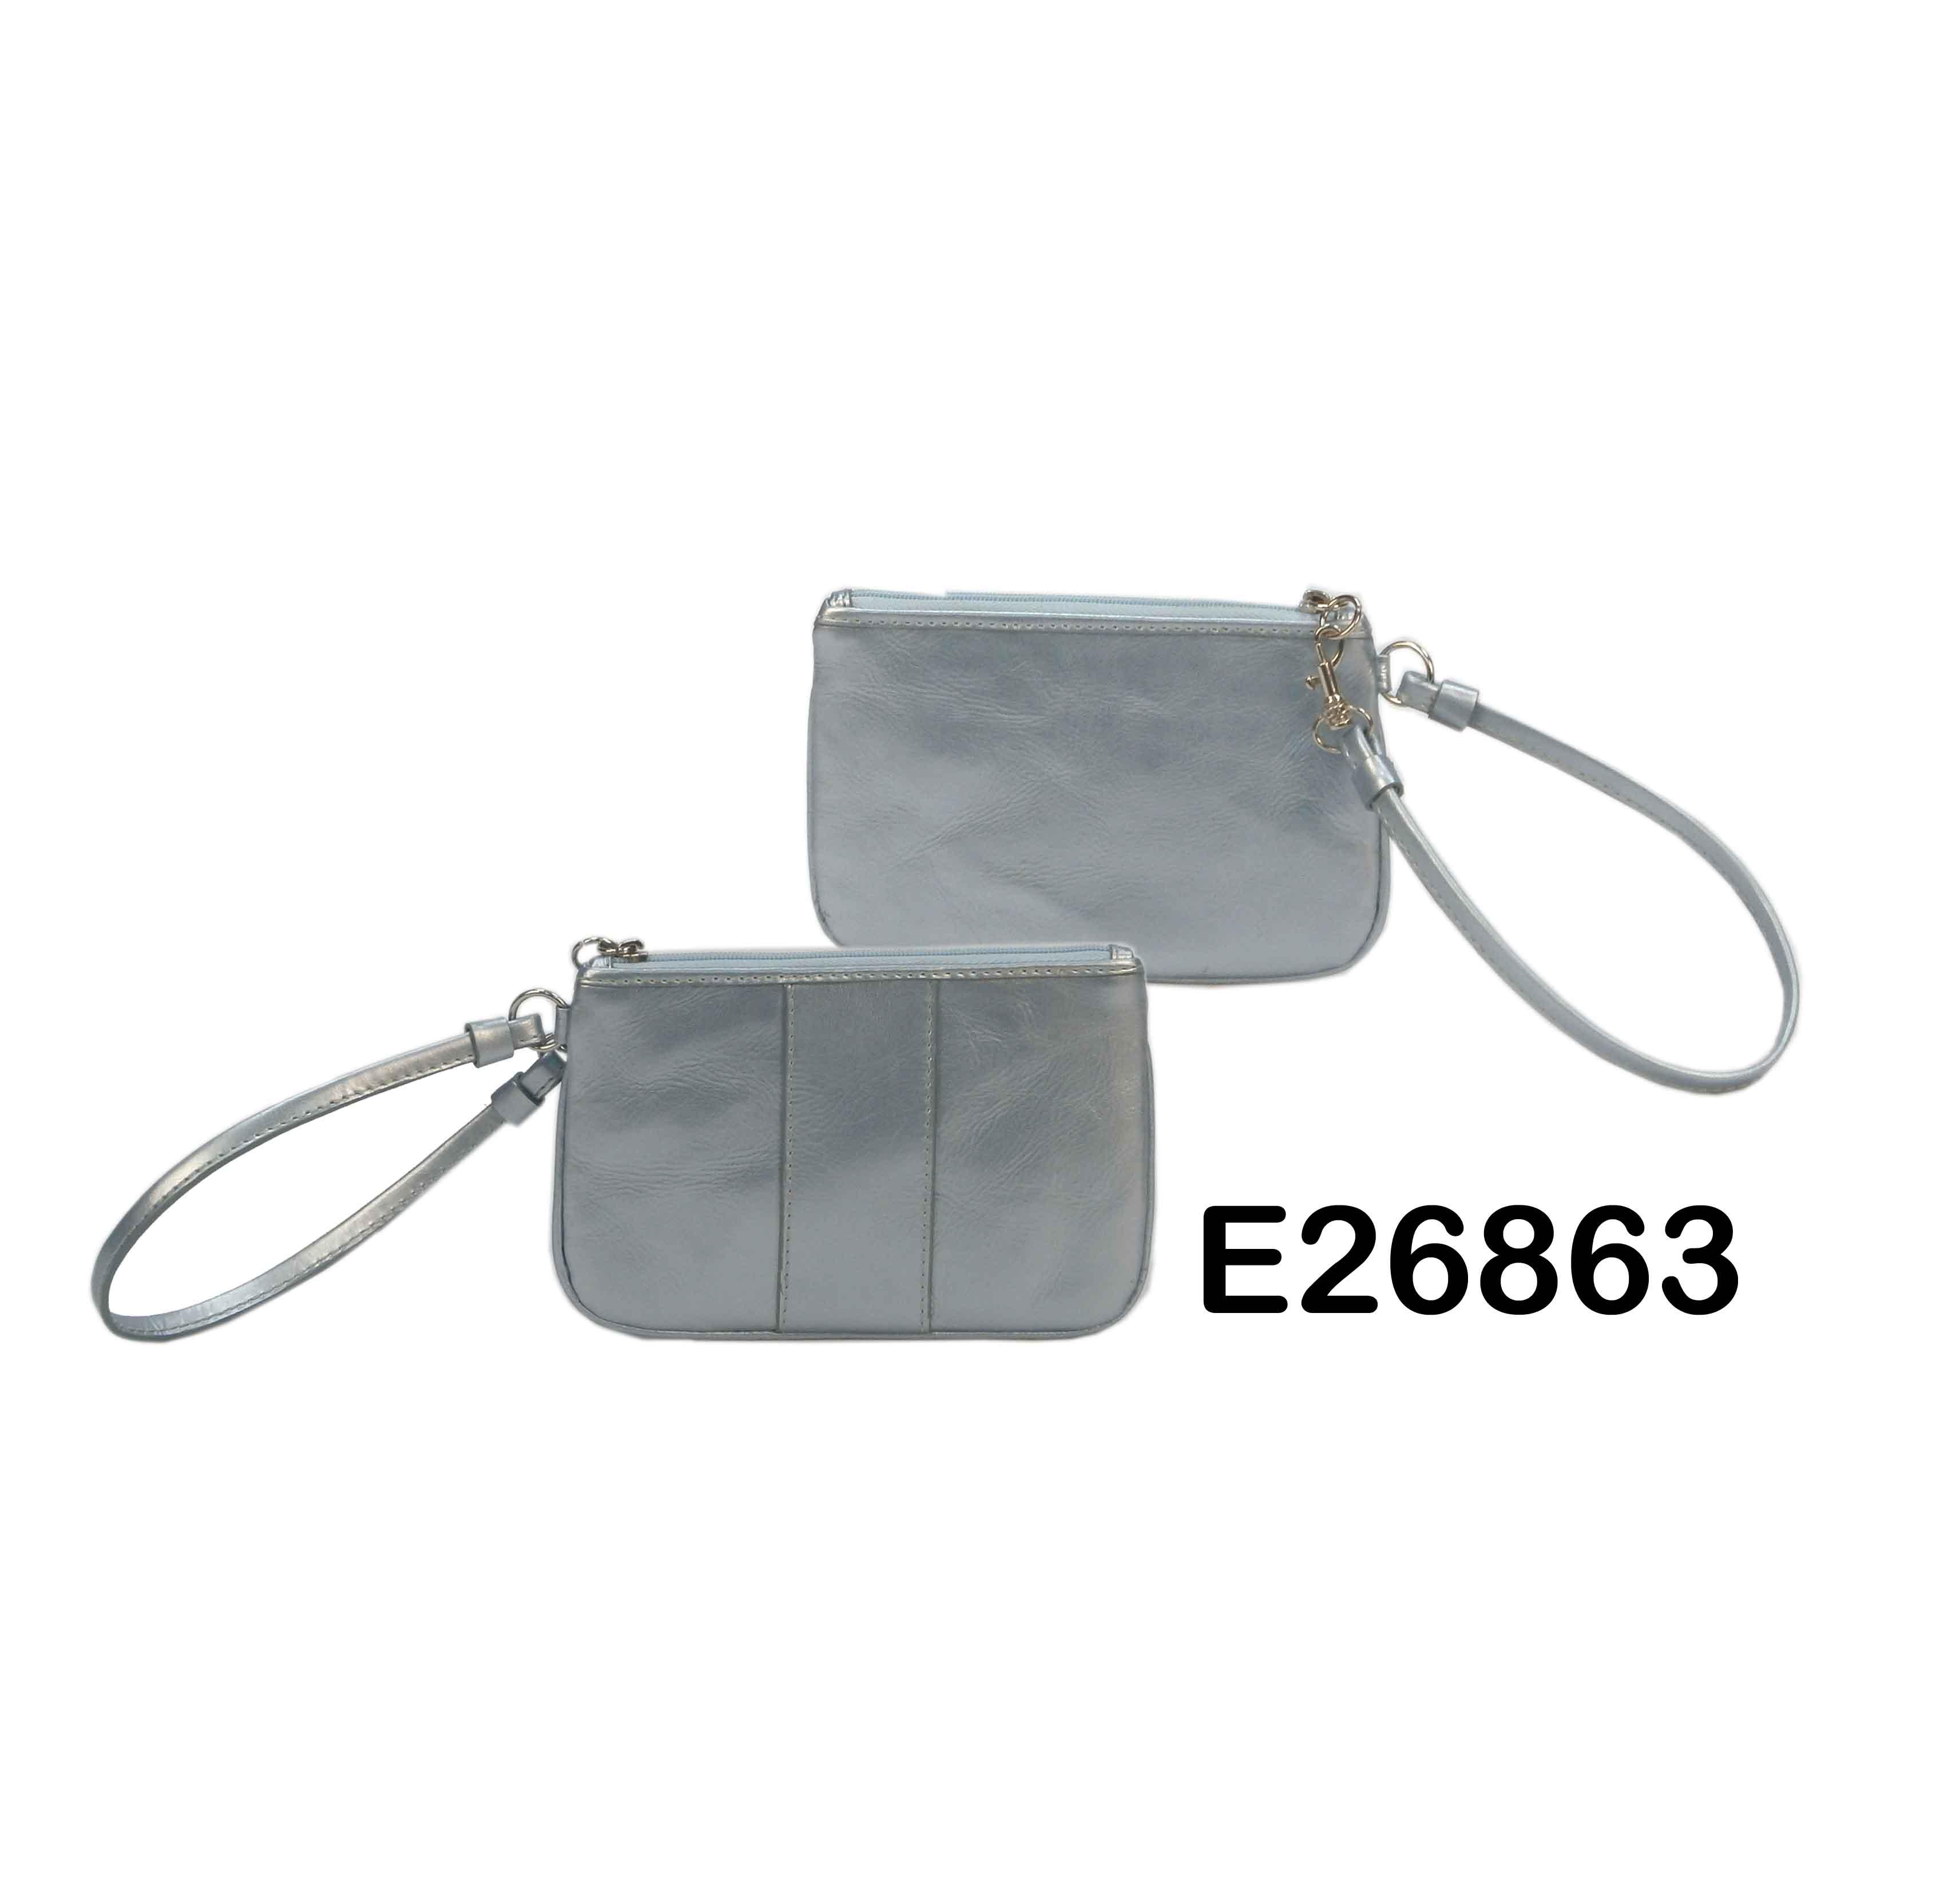 E26863 whole